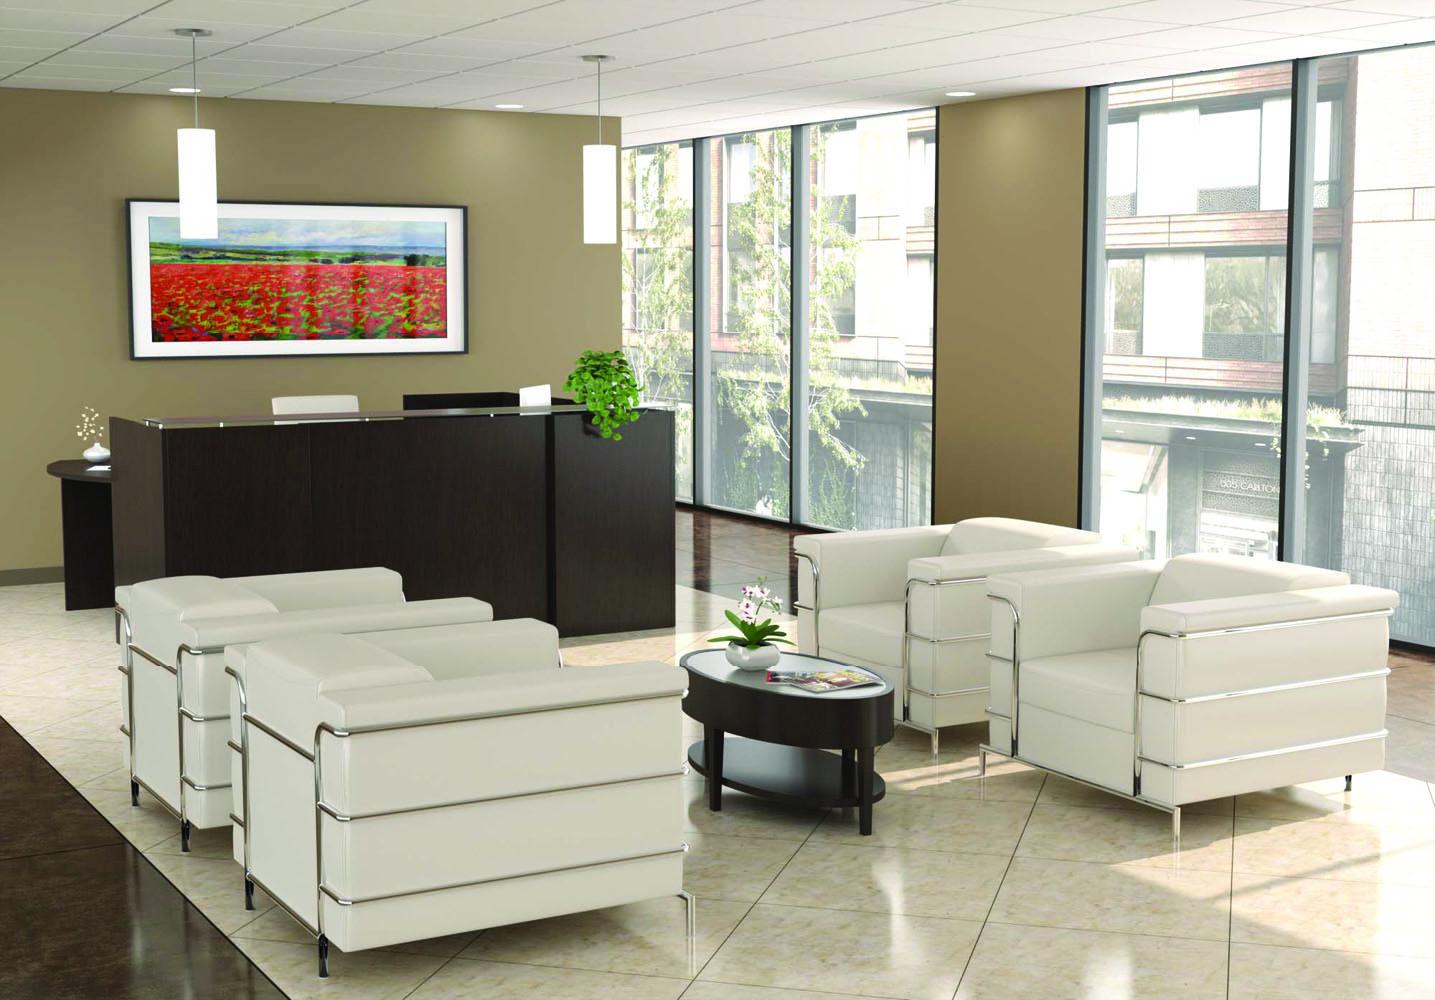 Office Lobby Design  Reception Area Furniture  Office